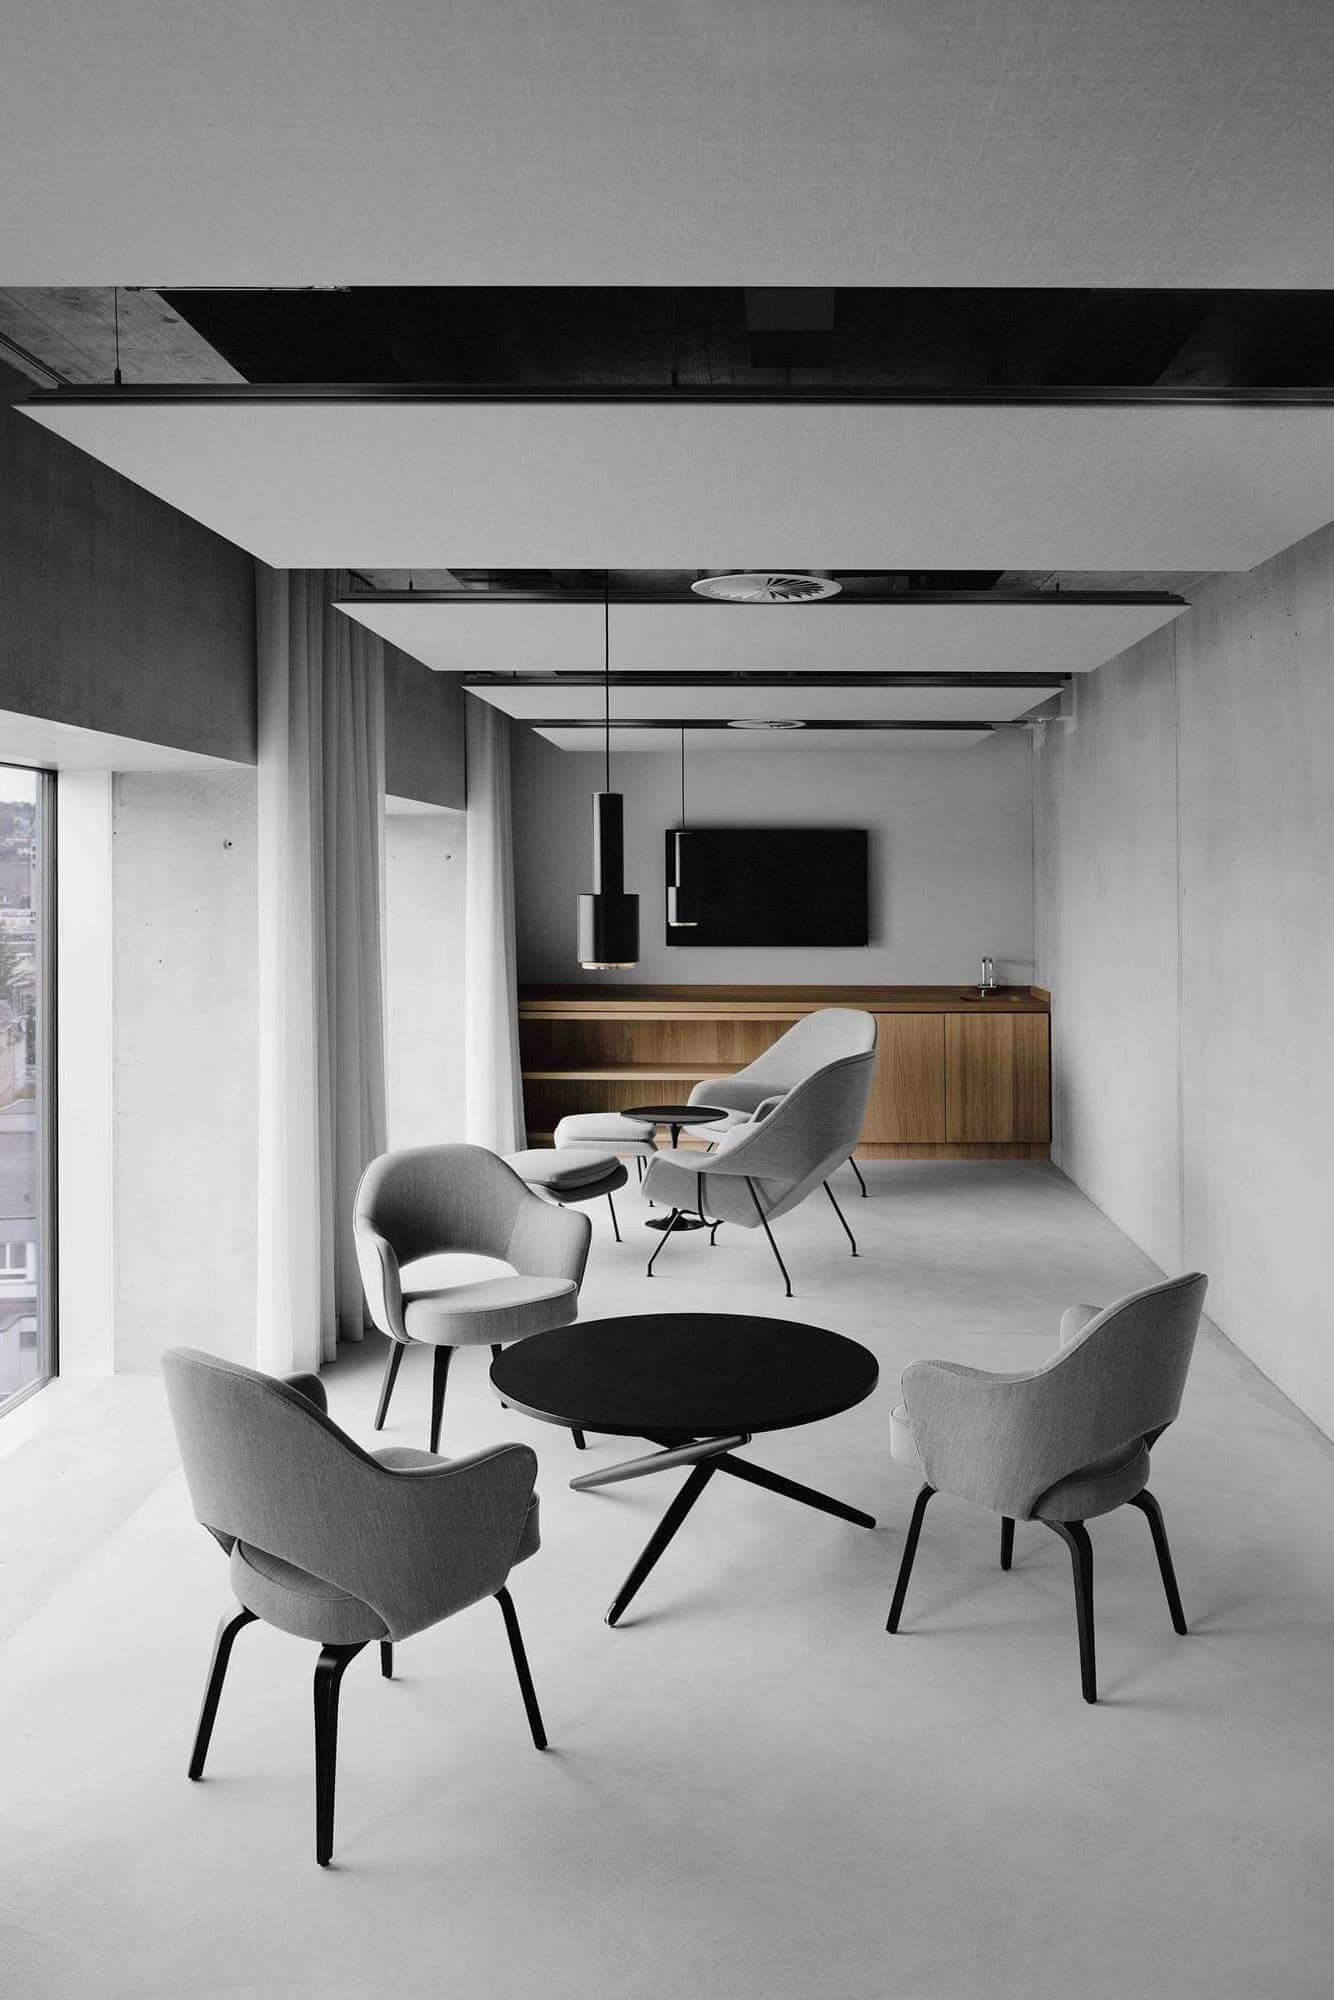 Commercial interior design clinic interior design commercial interiors interior design tips space